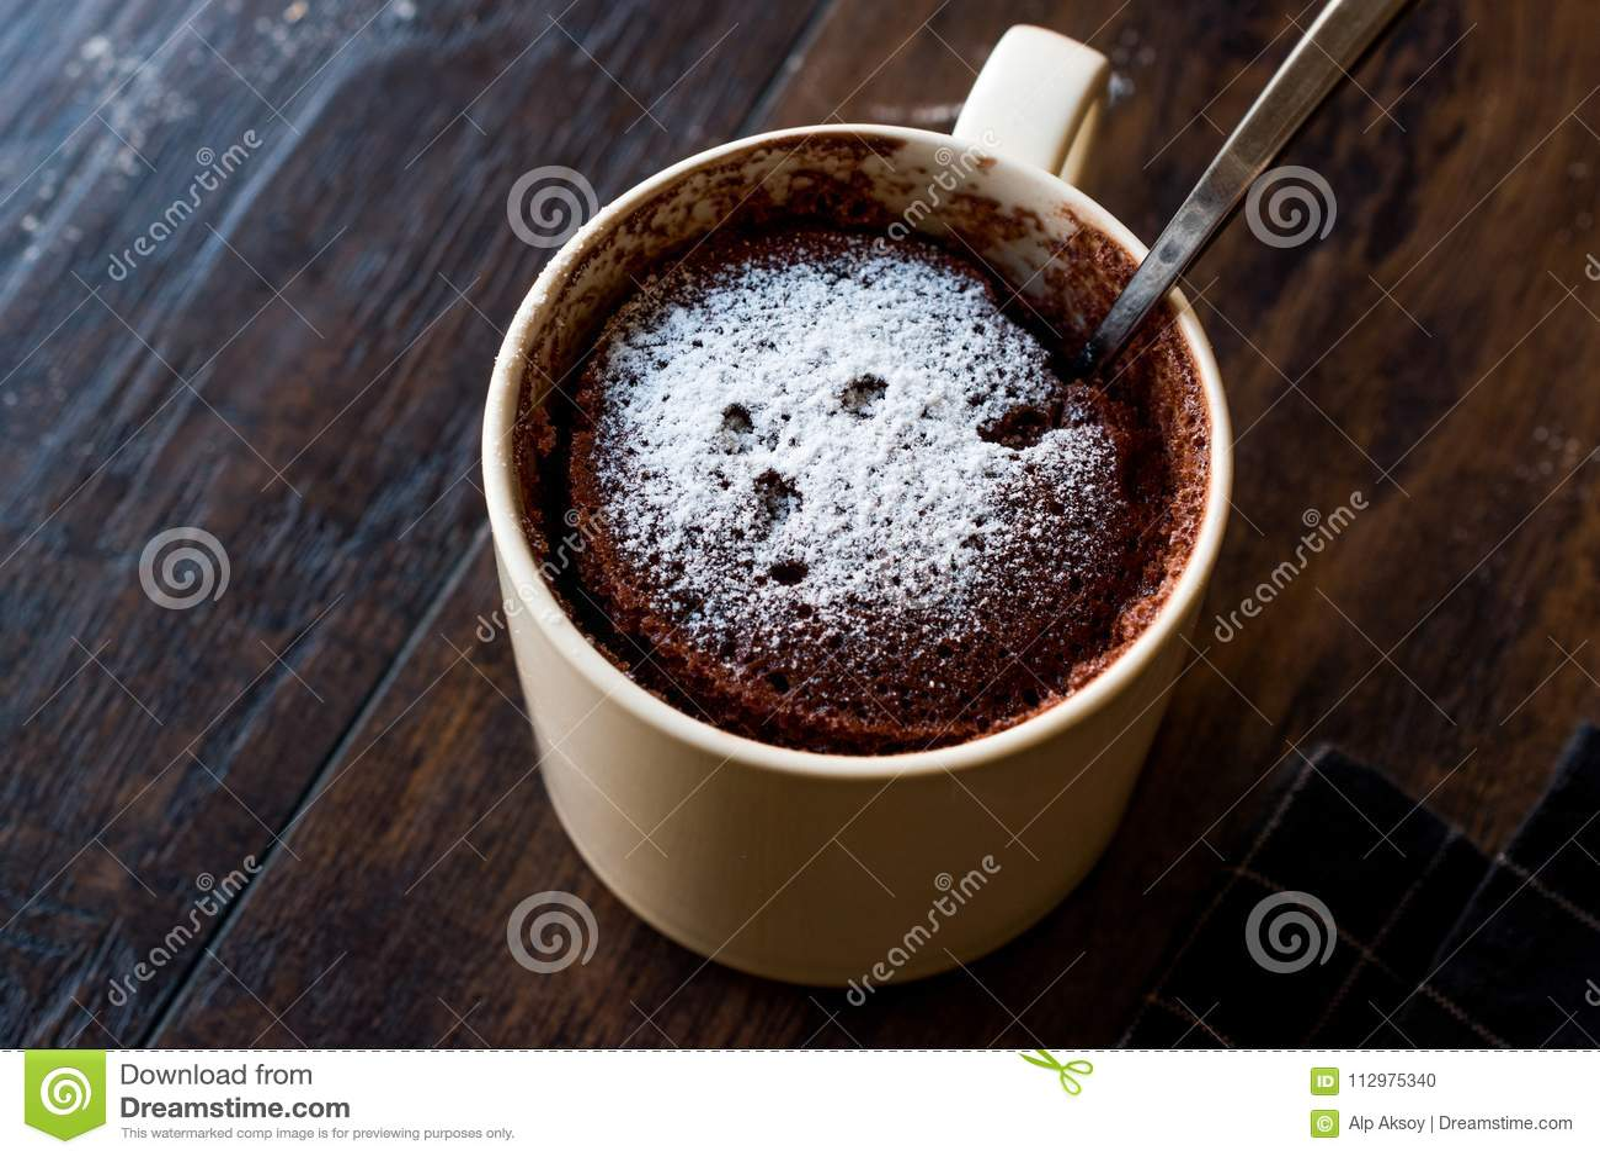 Microwave Brownie Chocolate Mug Cake with Powder Sugar on Dark Wooden Surface.